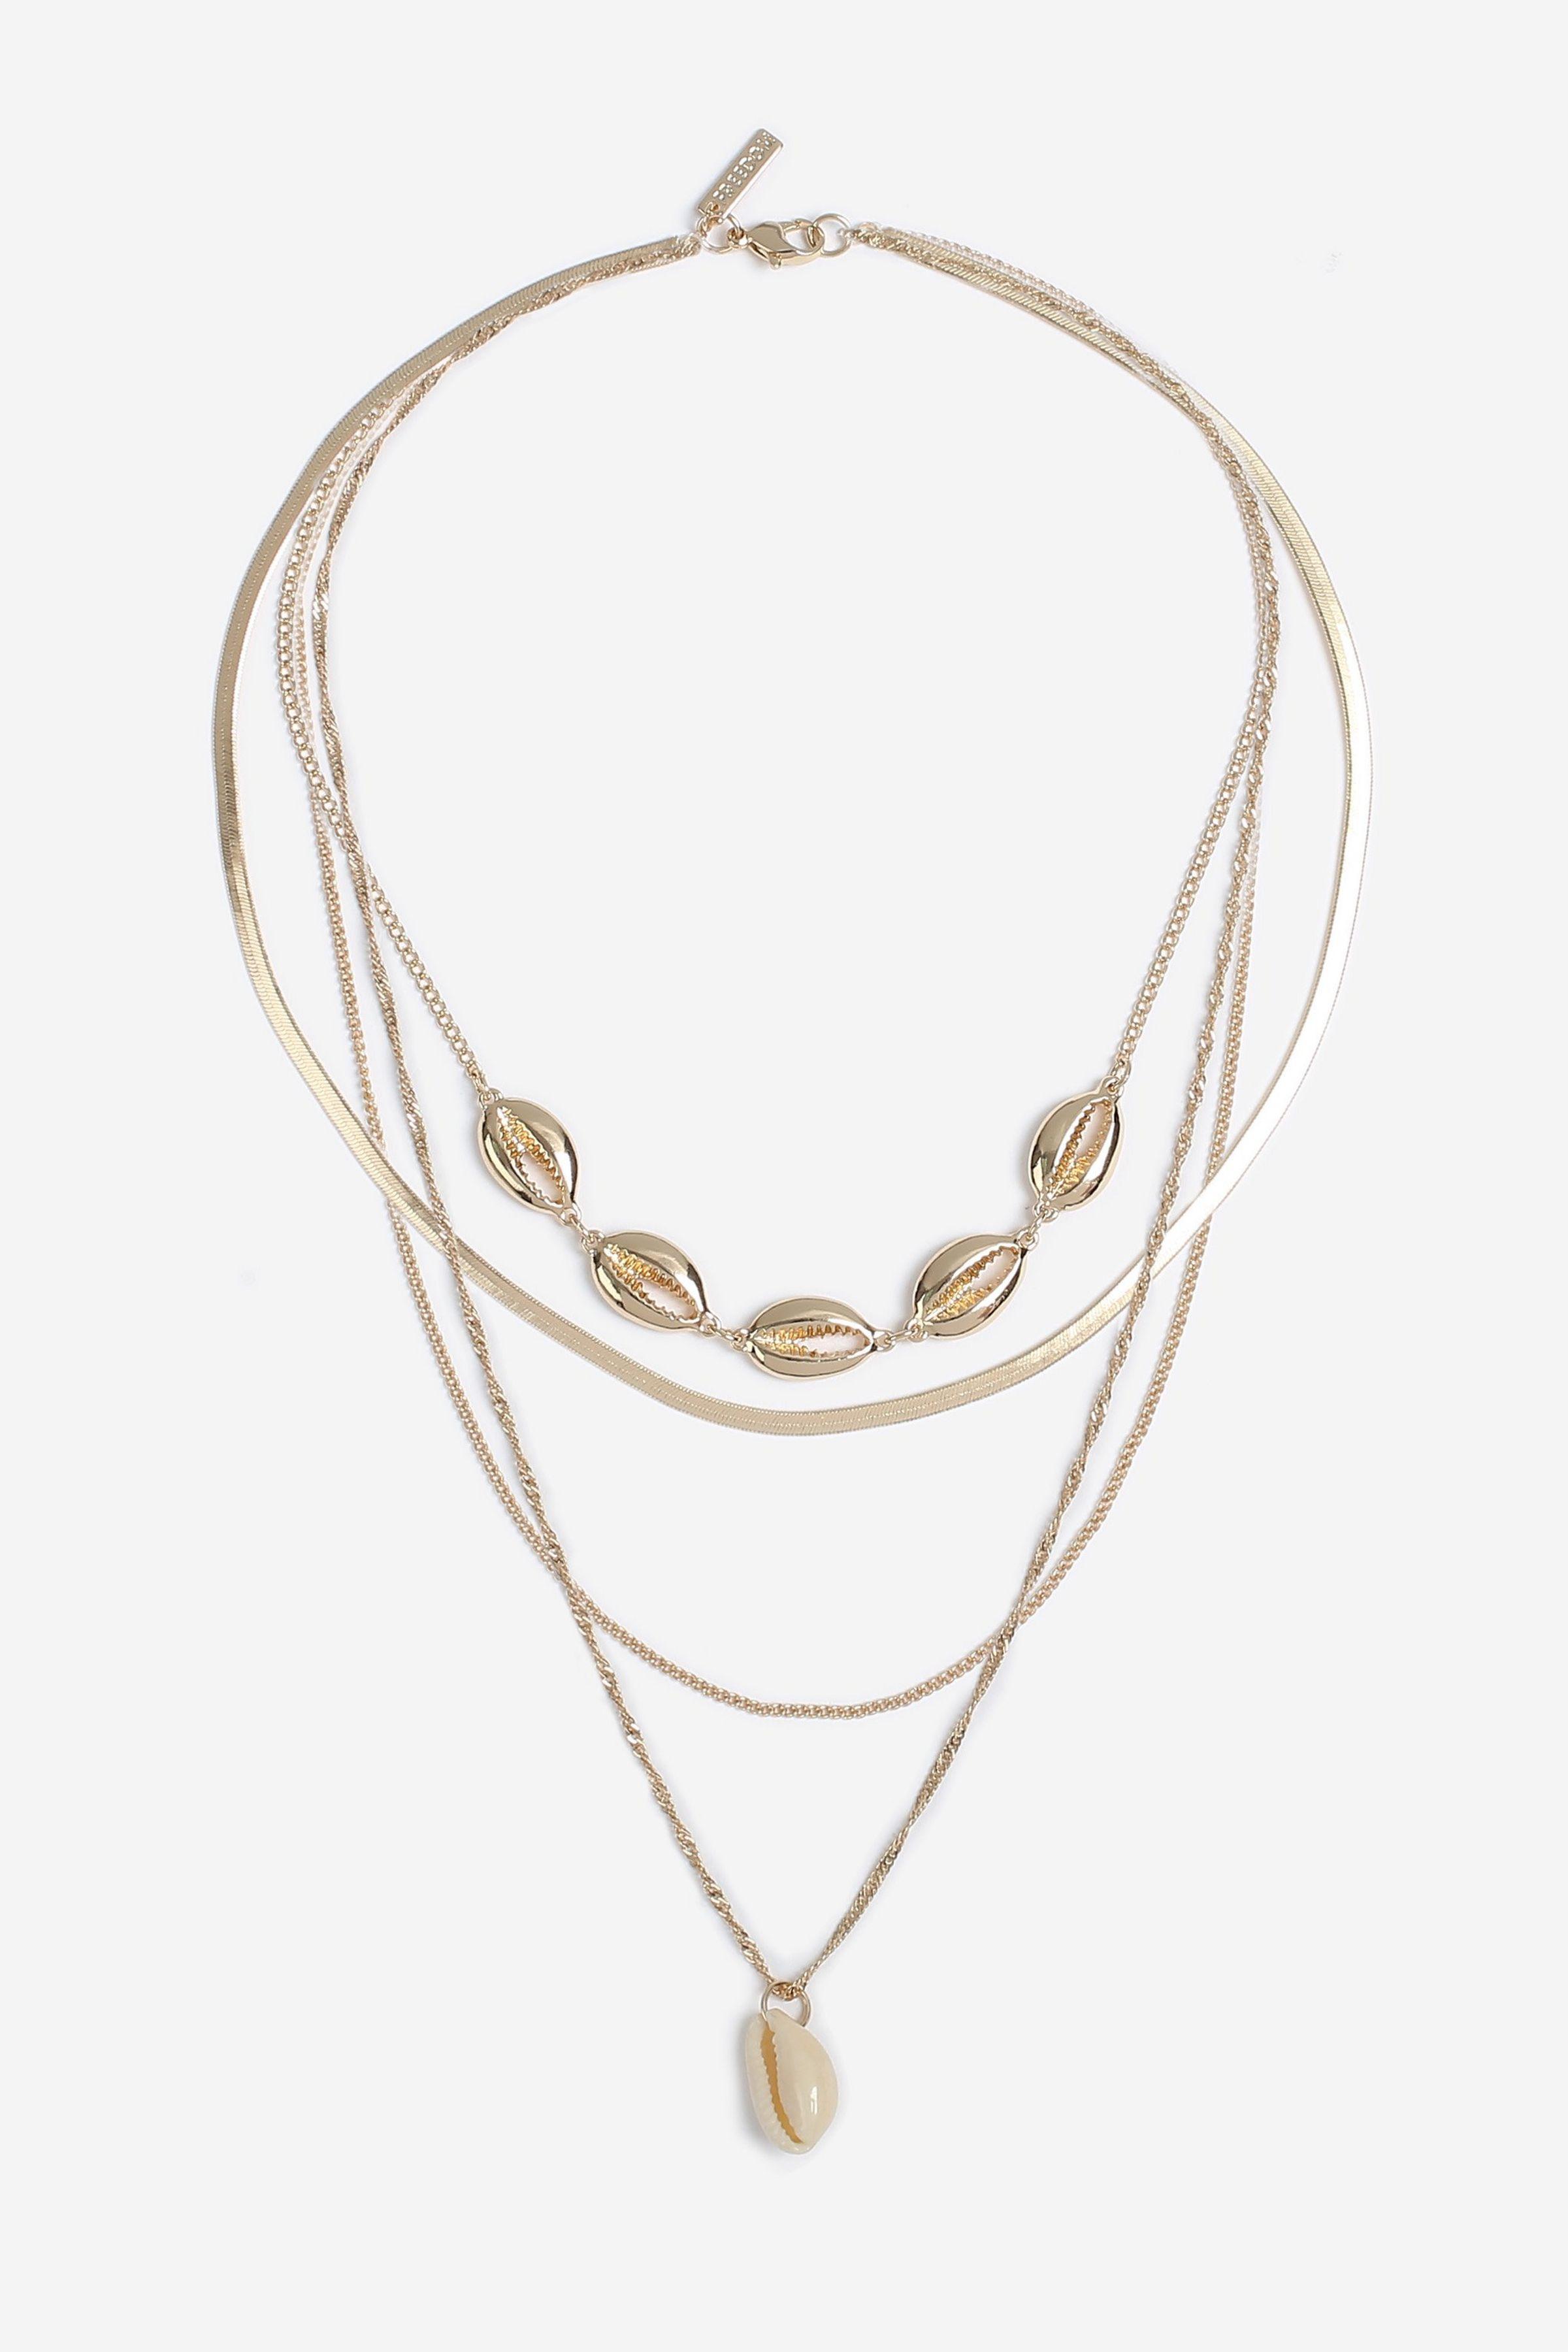 Conchi Shell Layered Necklace Jewelry Trends Fall Jewelry Jewelry